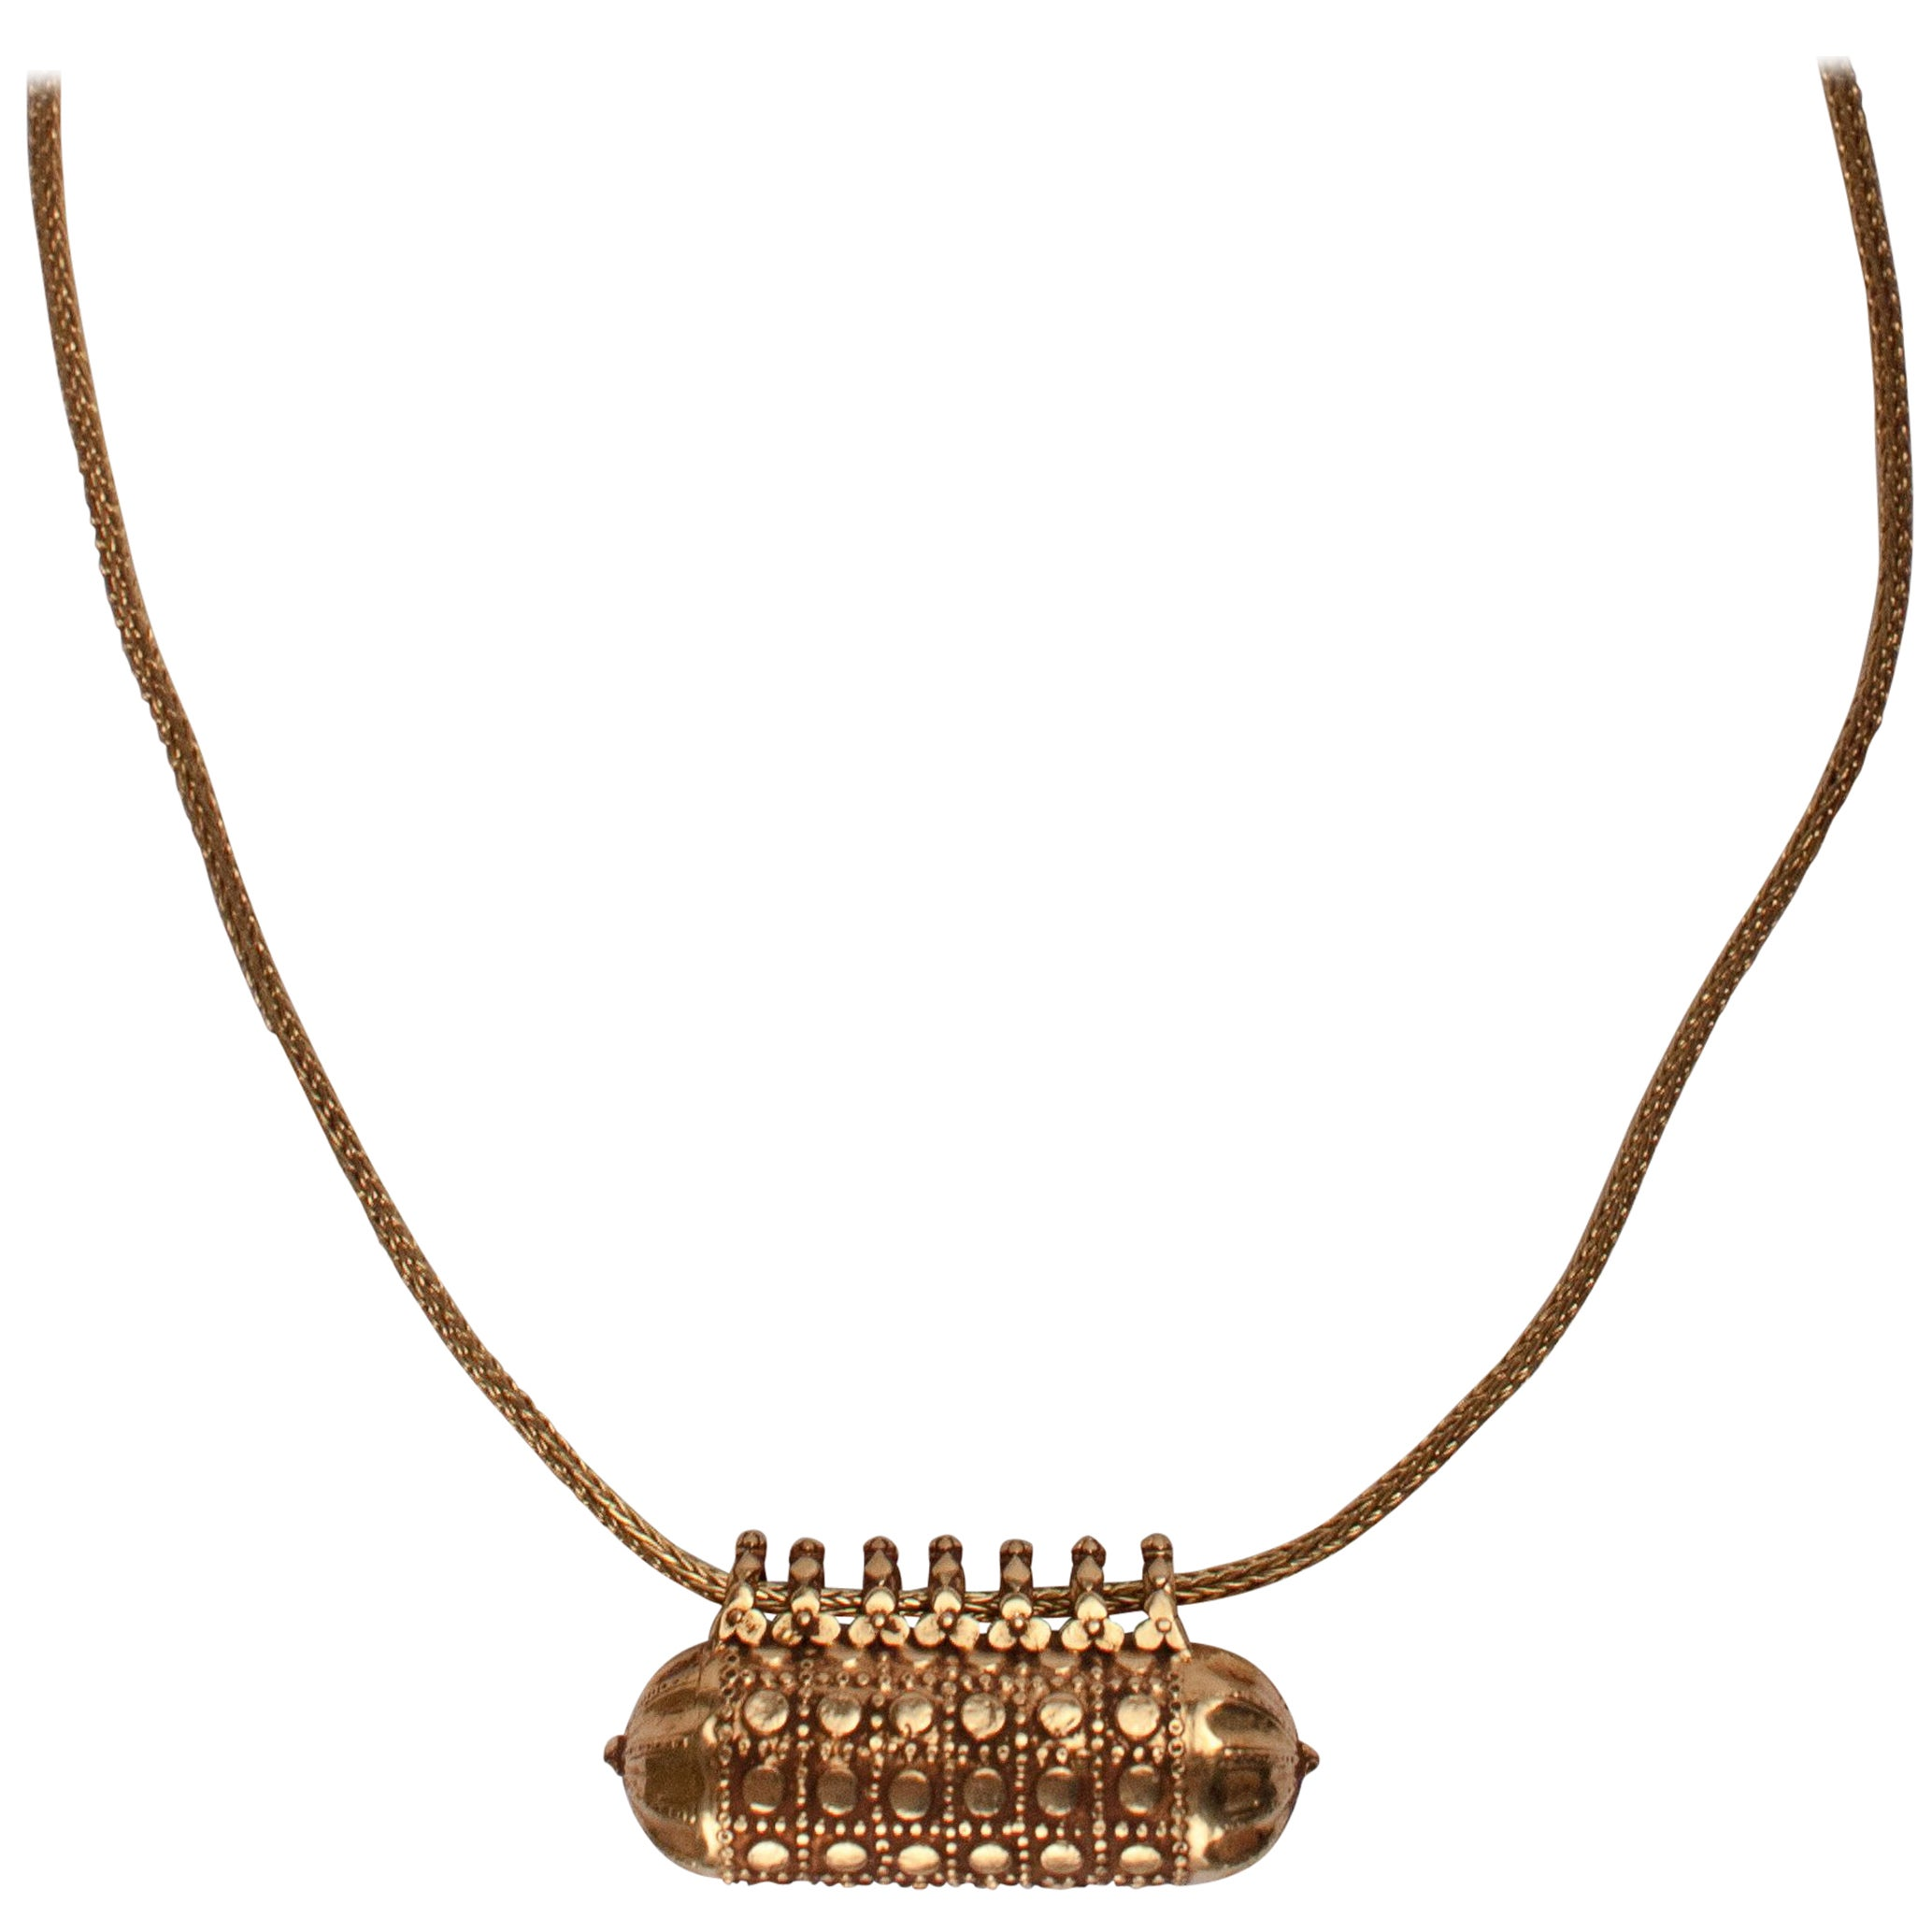 18-Karat Gold Indian Amulet Pendant Necklace